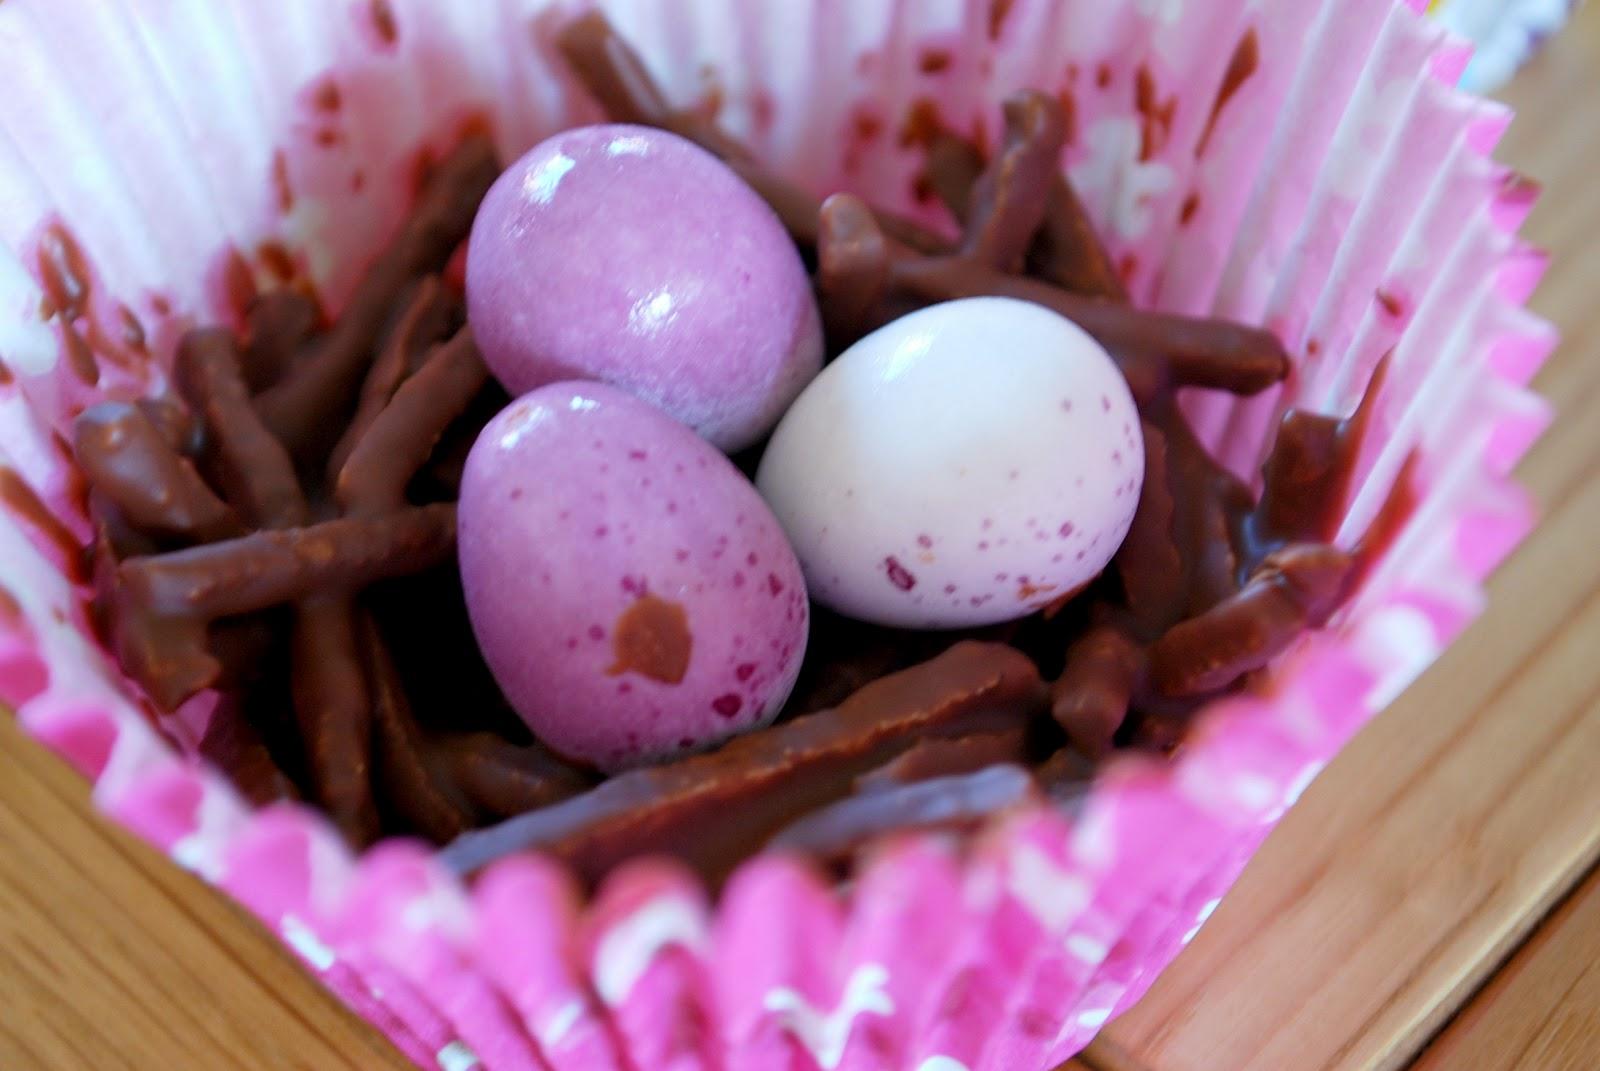 Domestic Sluttery: Sluttishly Simple: Easter Egg Nests